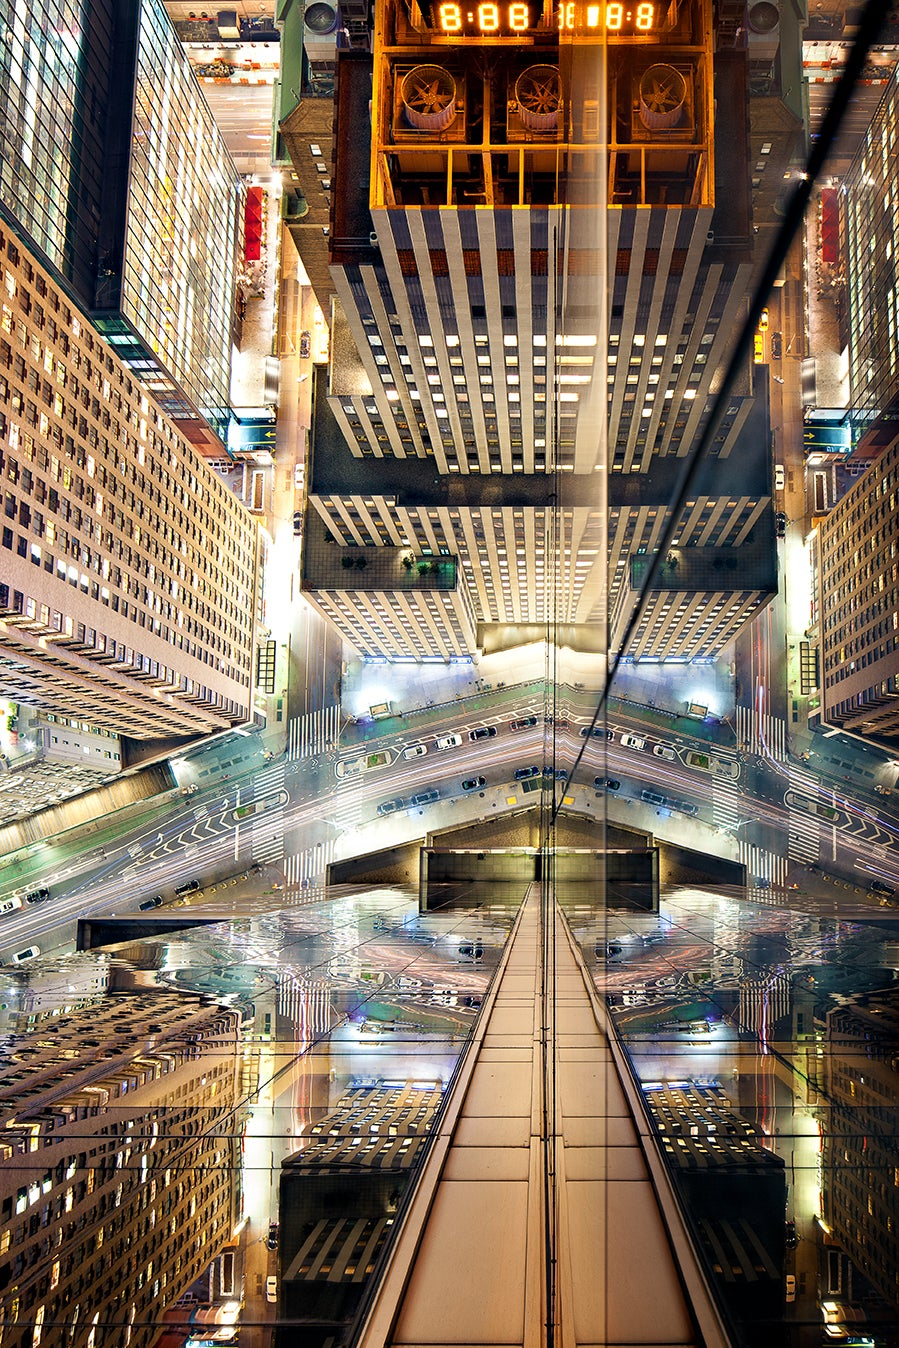 Stunning photos of windows transform New York City into a starship